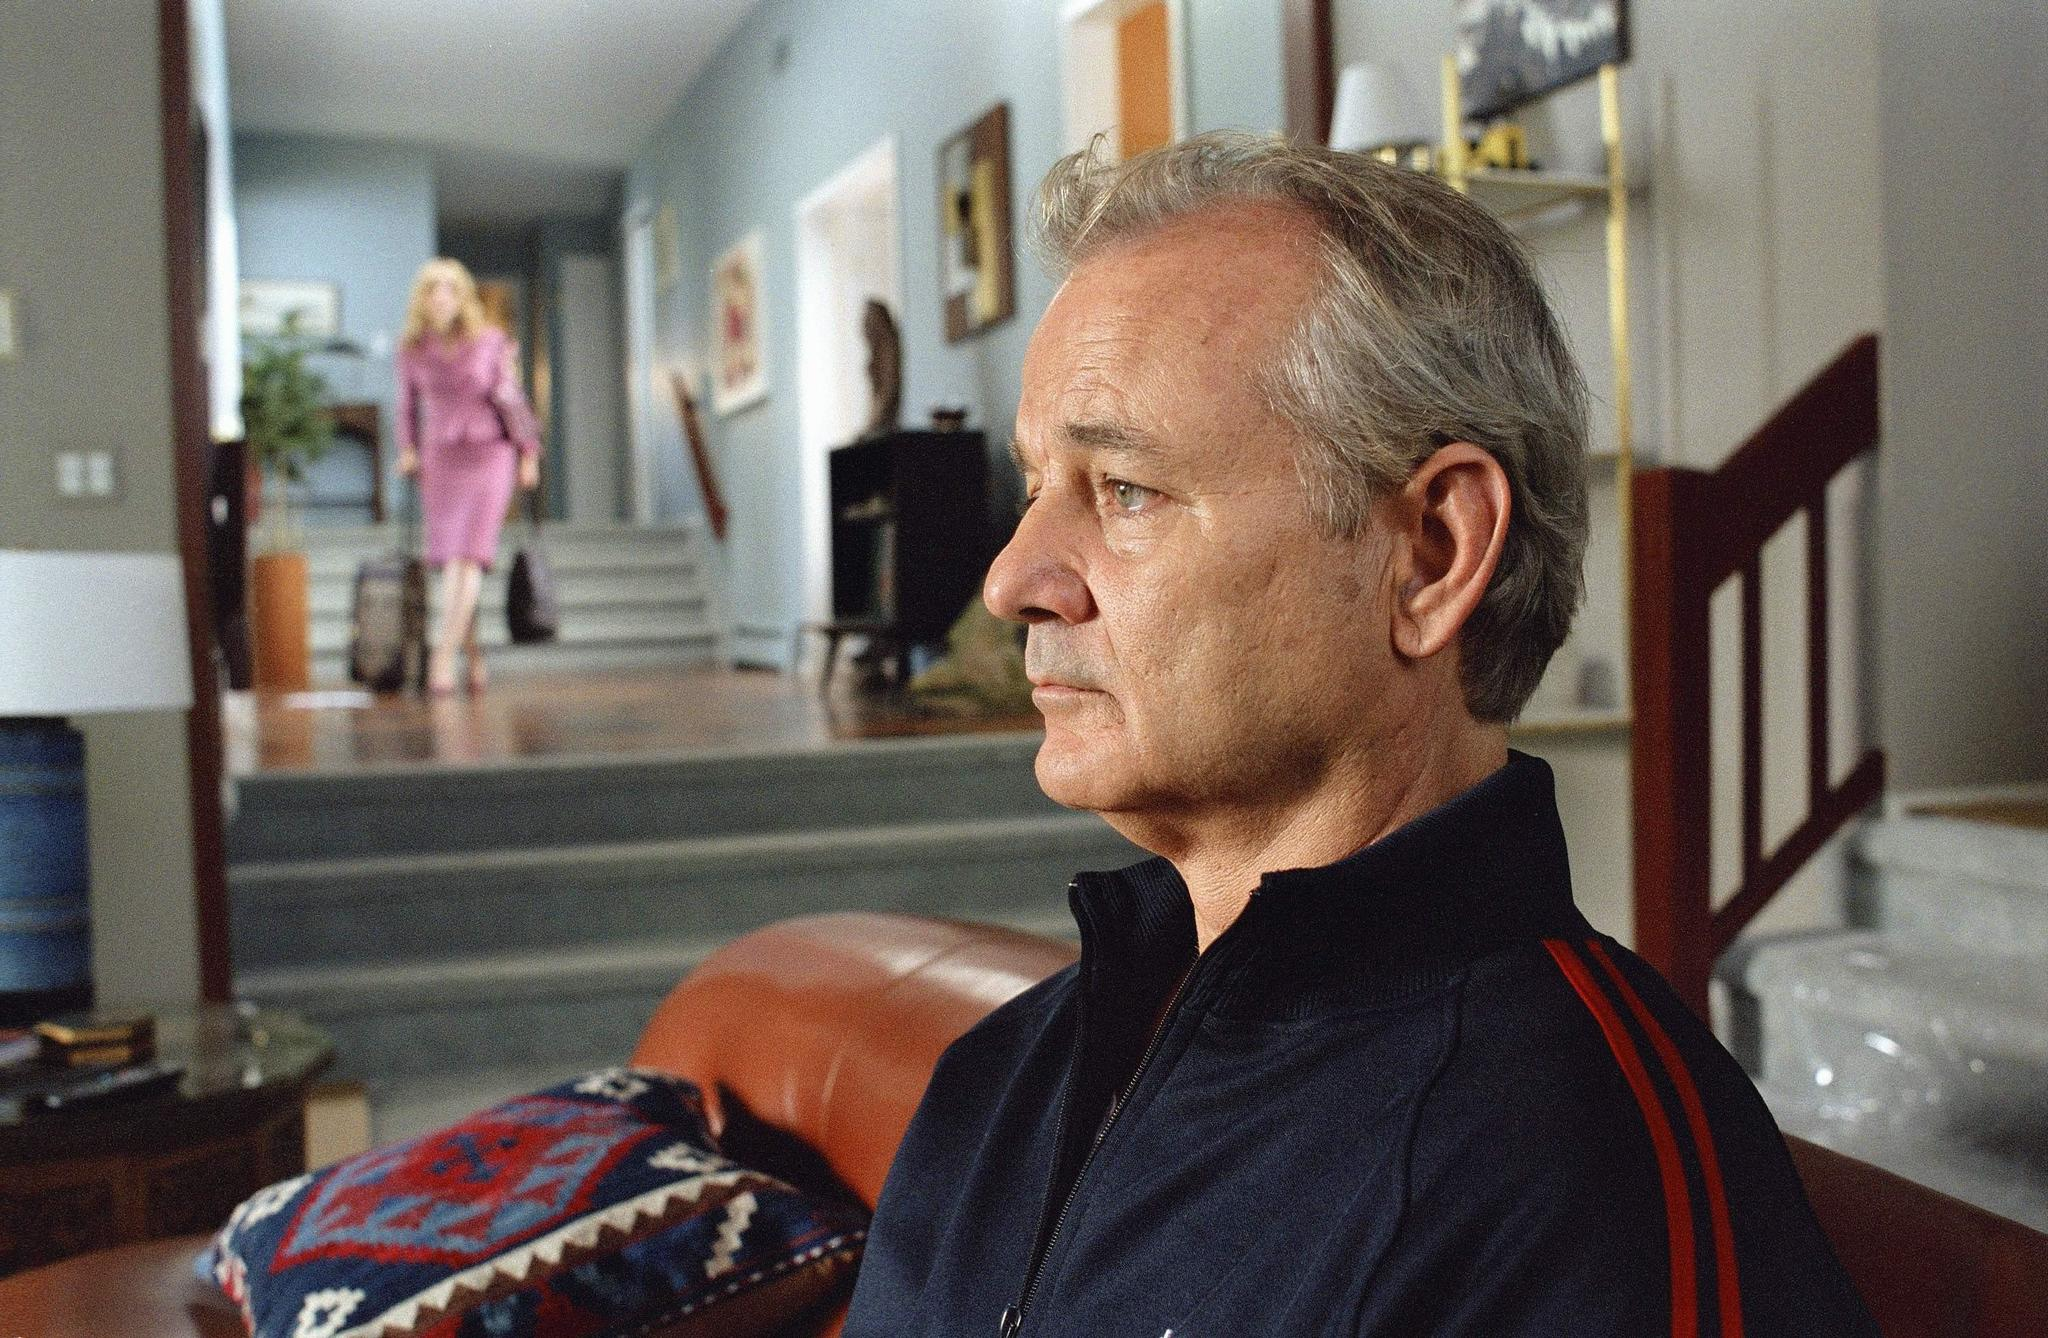 Bill Murray and Julie Delpy in Broken Flowers (2005)